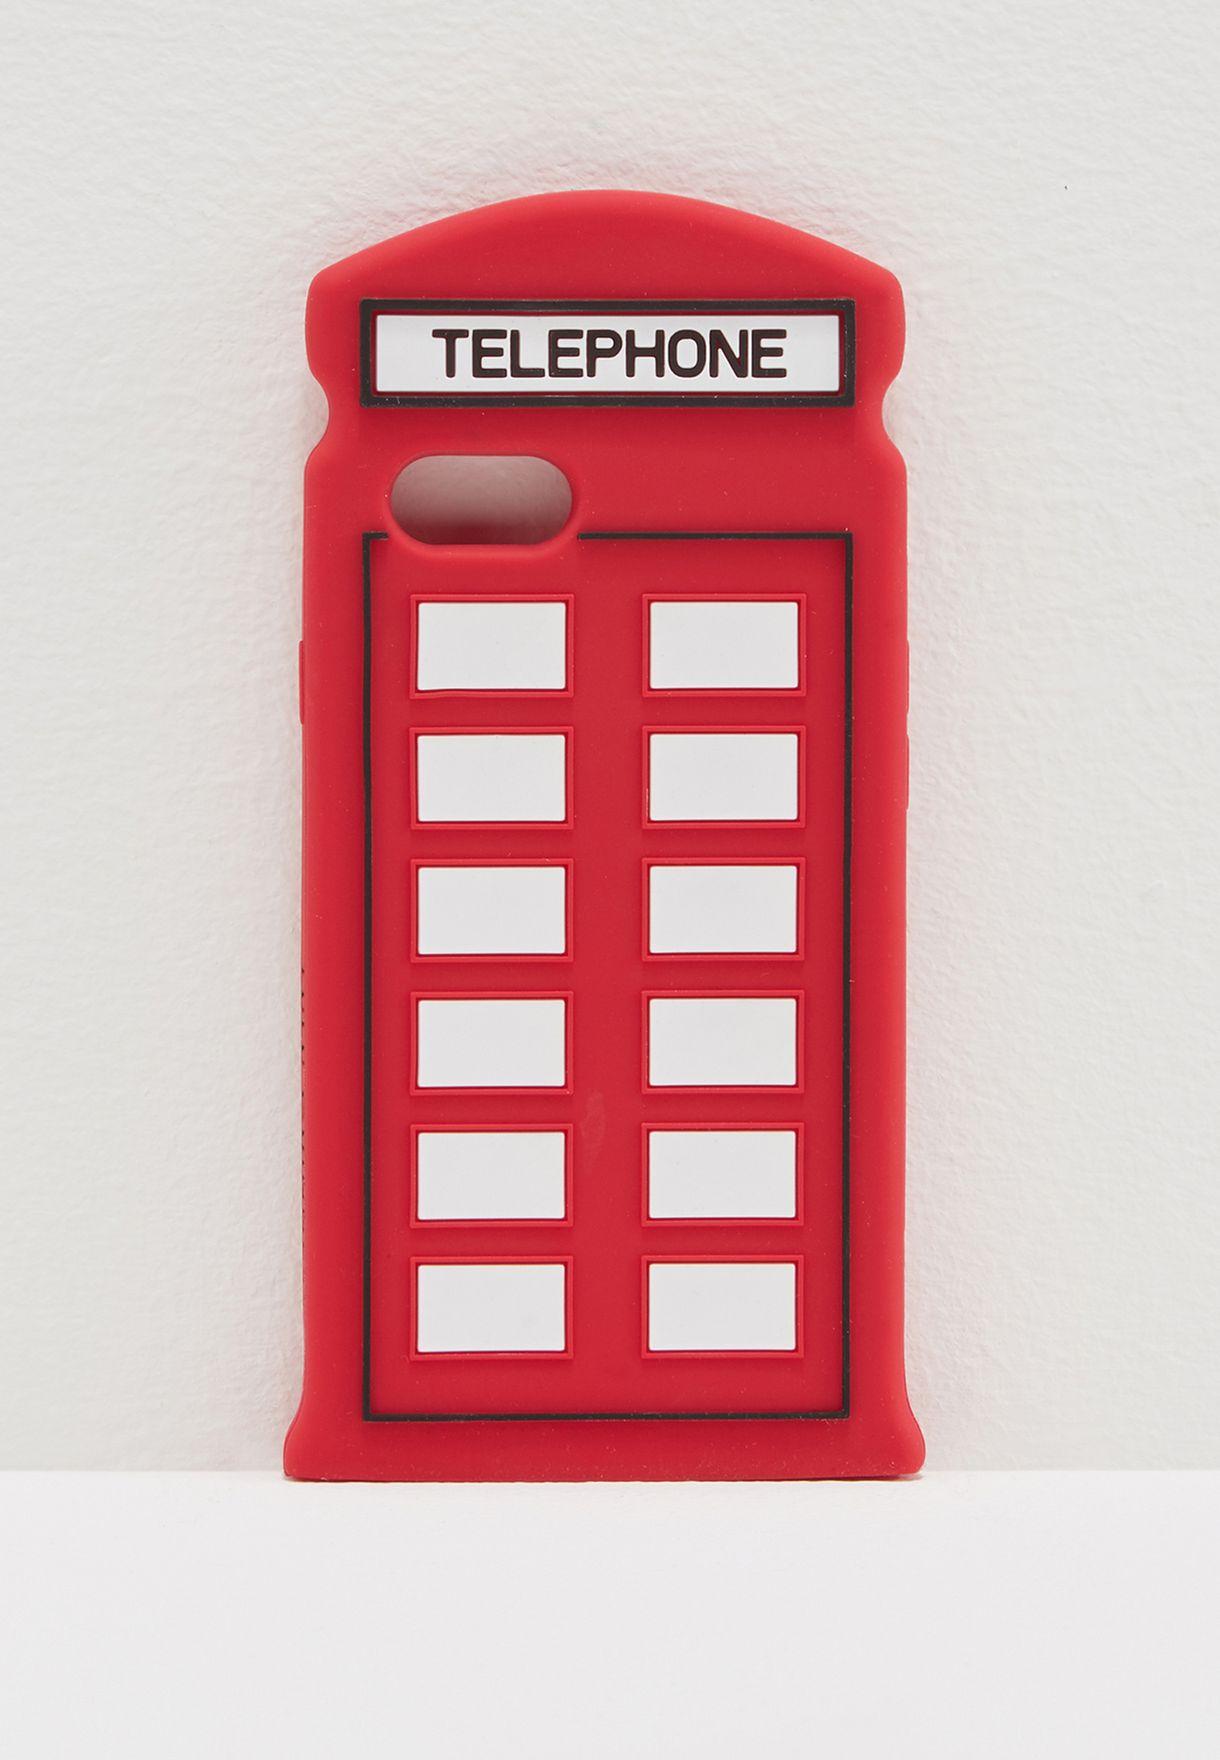 bda810526 تسوق حافظة هاتف ايفون 7 ماركة لولو غينيس لون أحمر 50129898 في ...